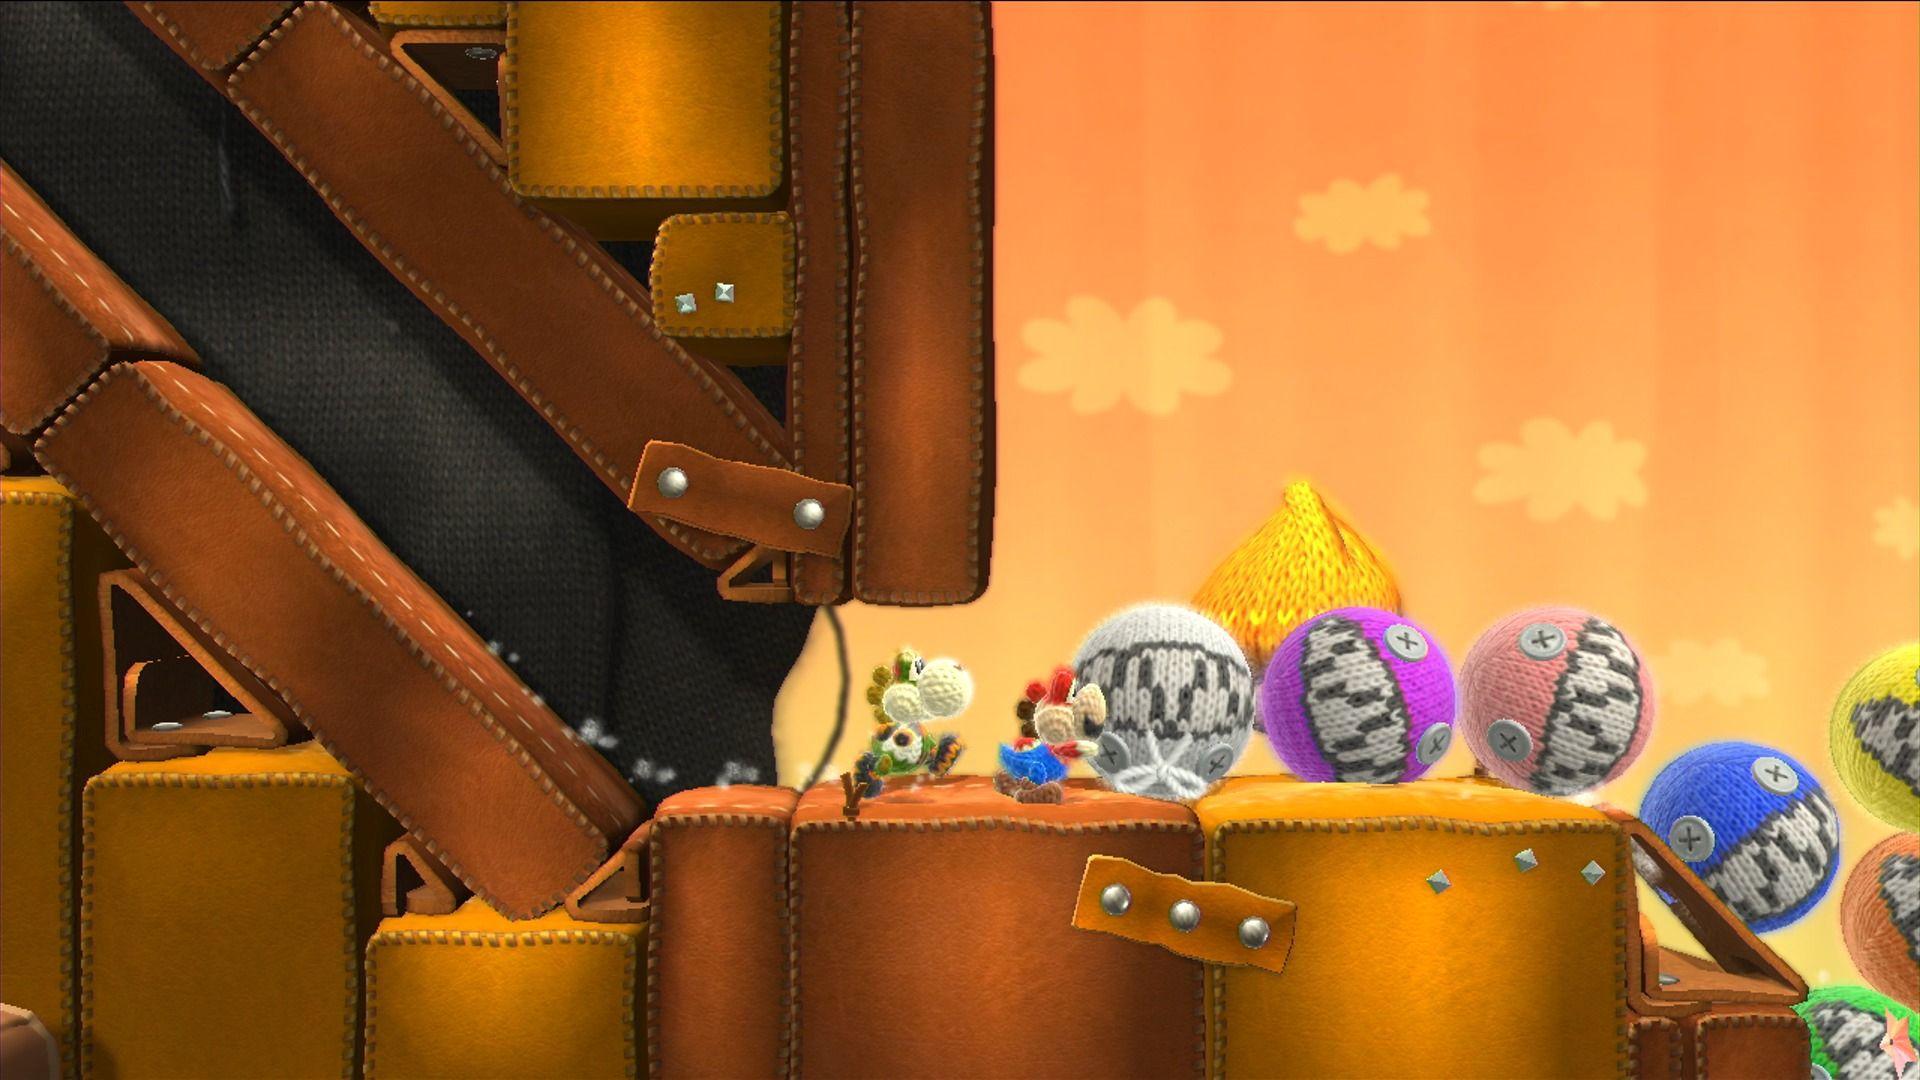 [r] Yoshi's Woolly World 3